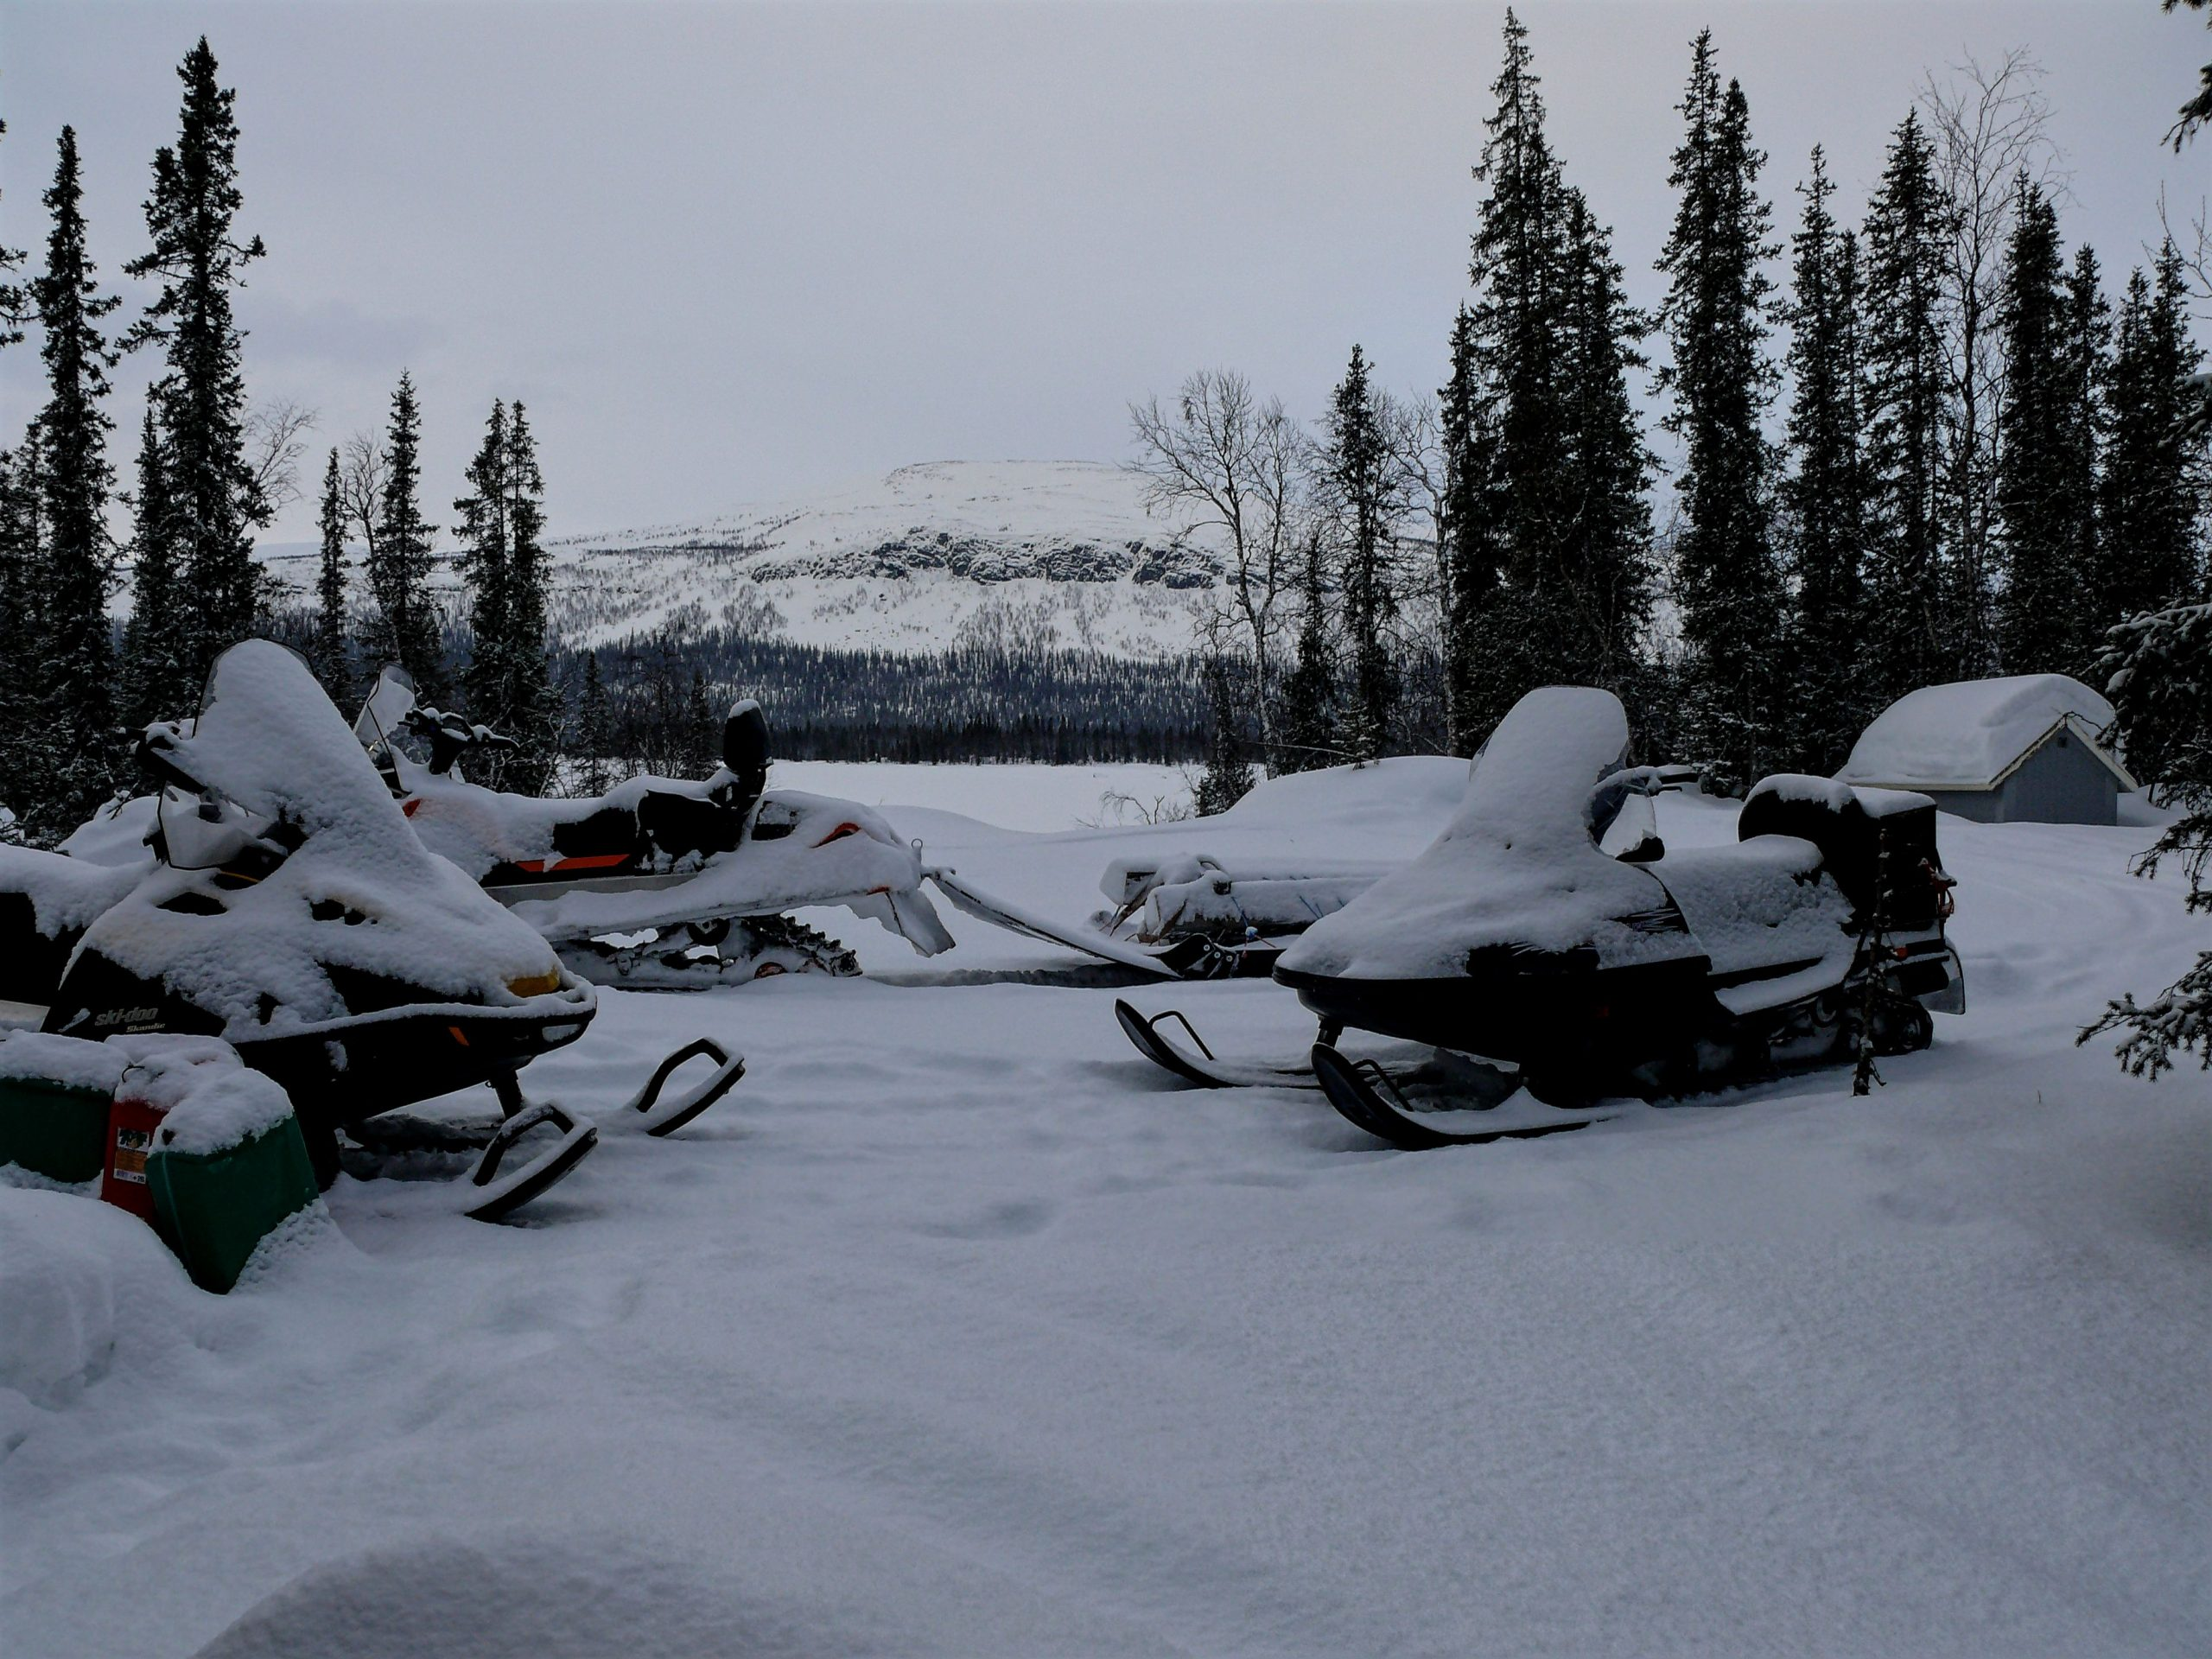 JokkmokkArcticDream-Snowmobile2015- private-tour2